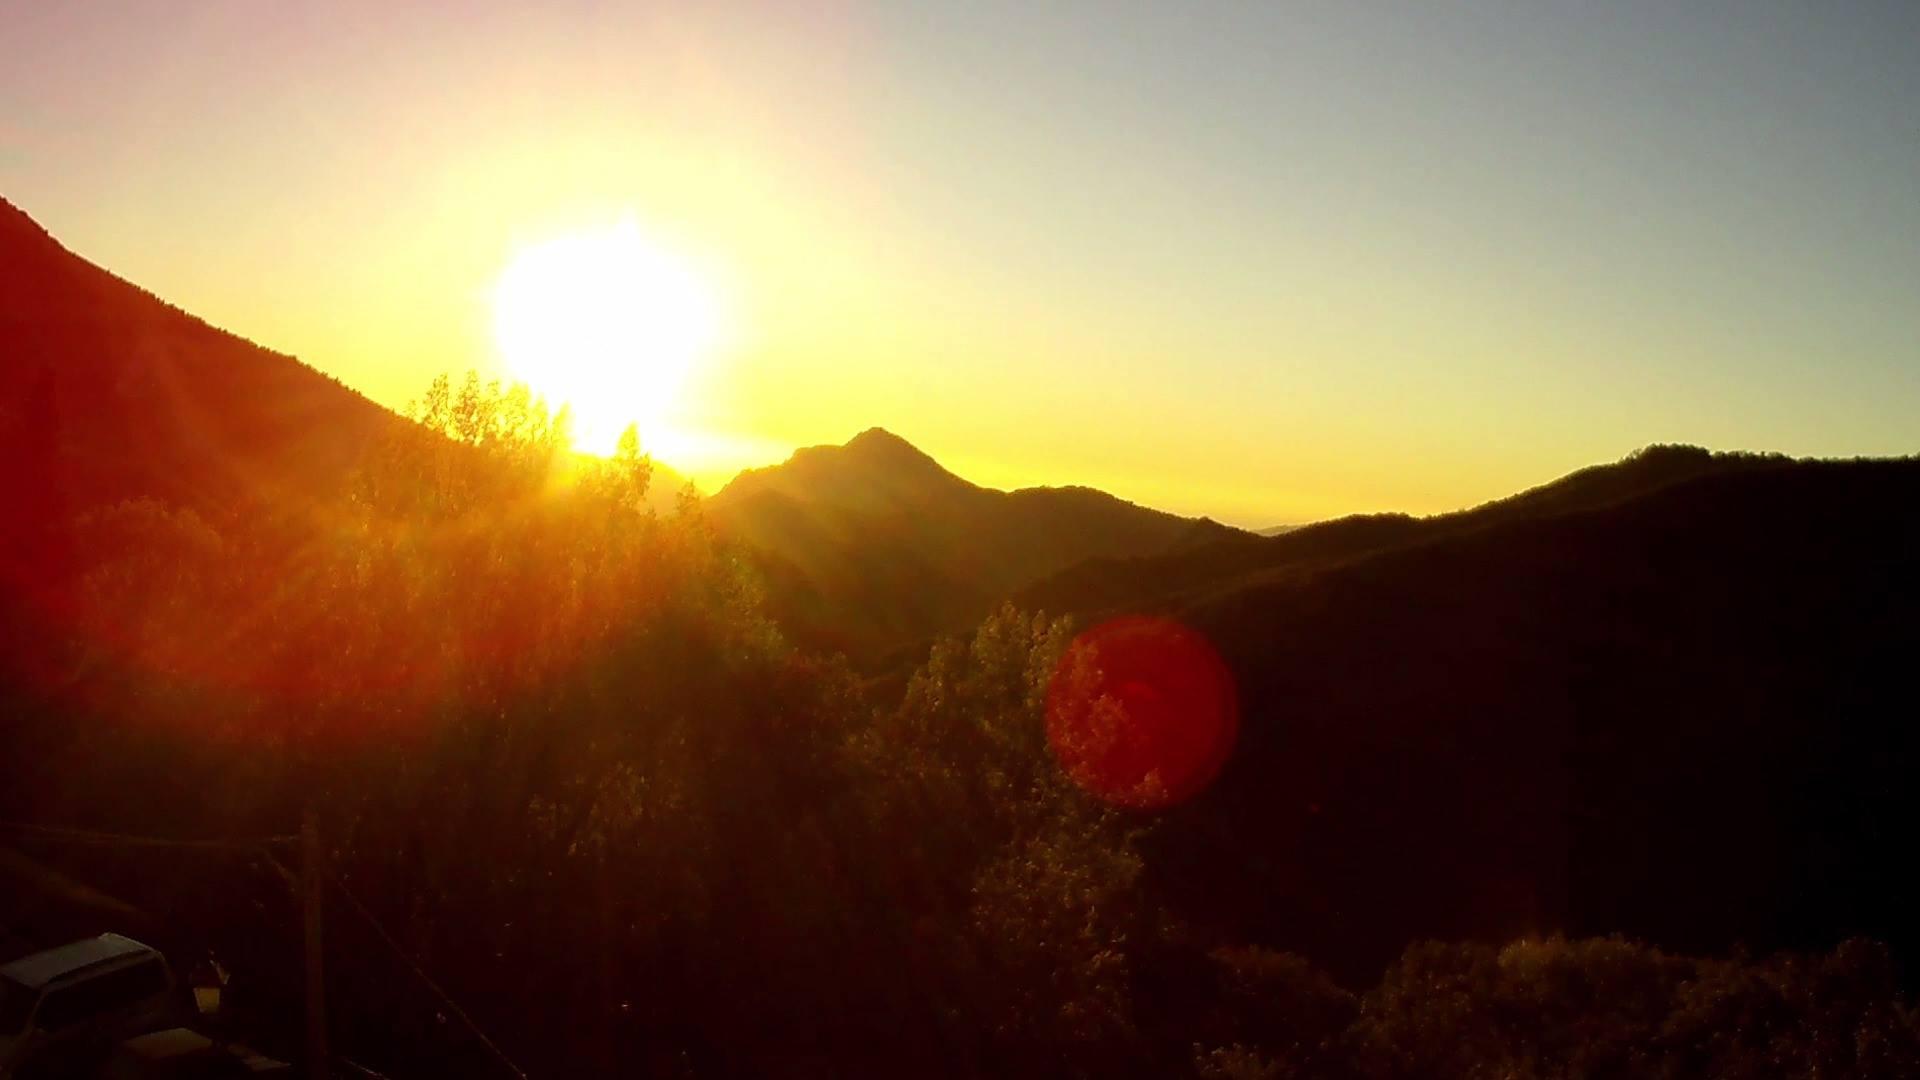 L'alba di questa mattina